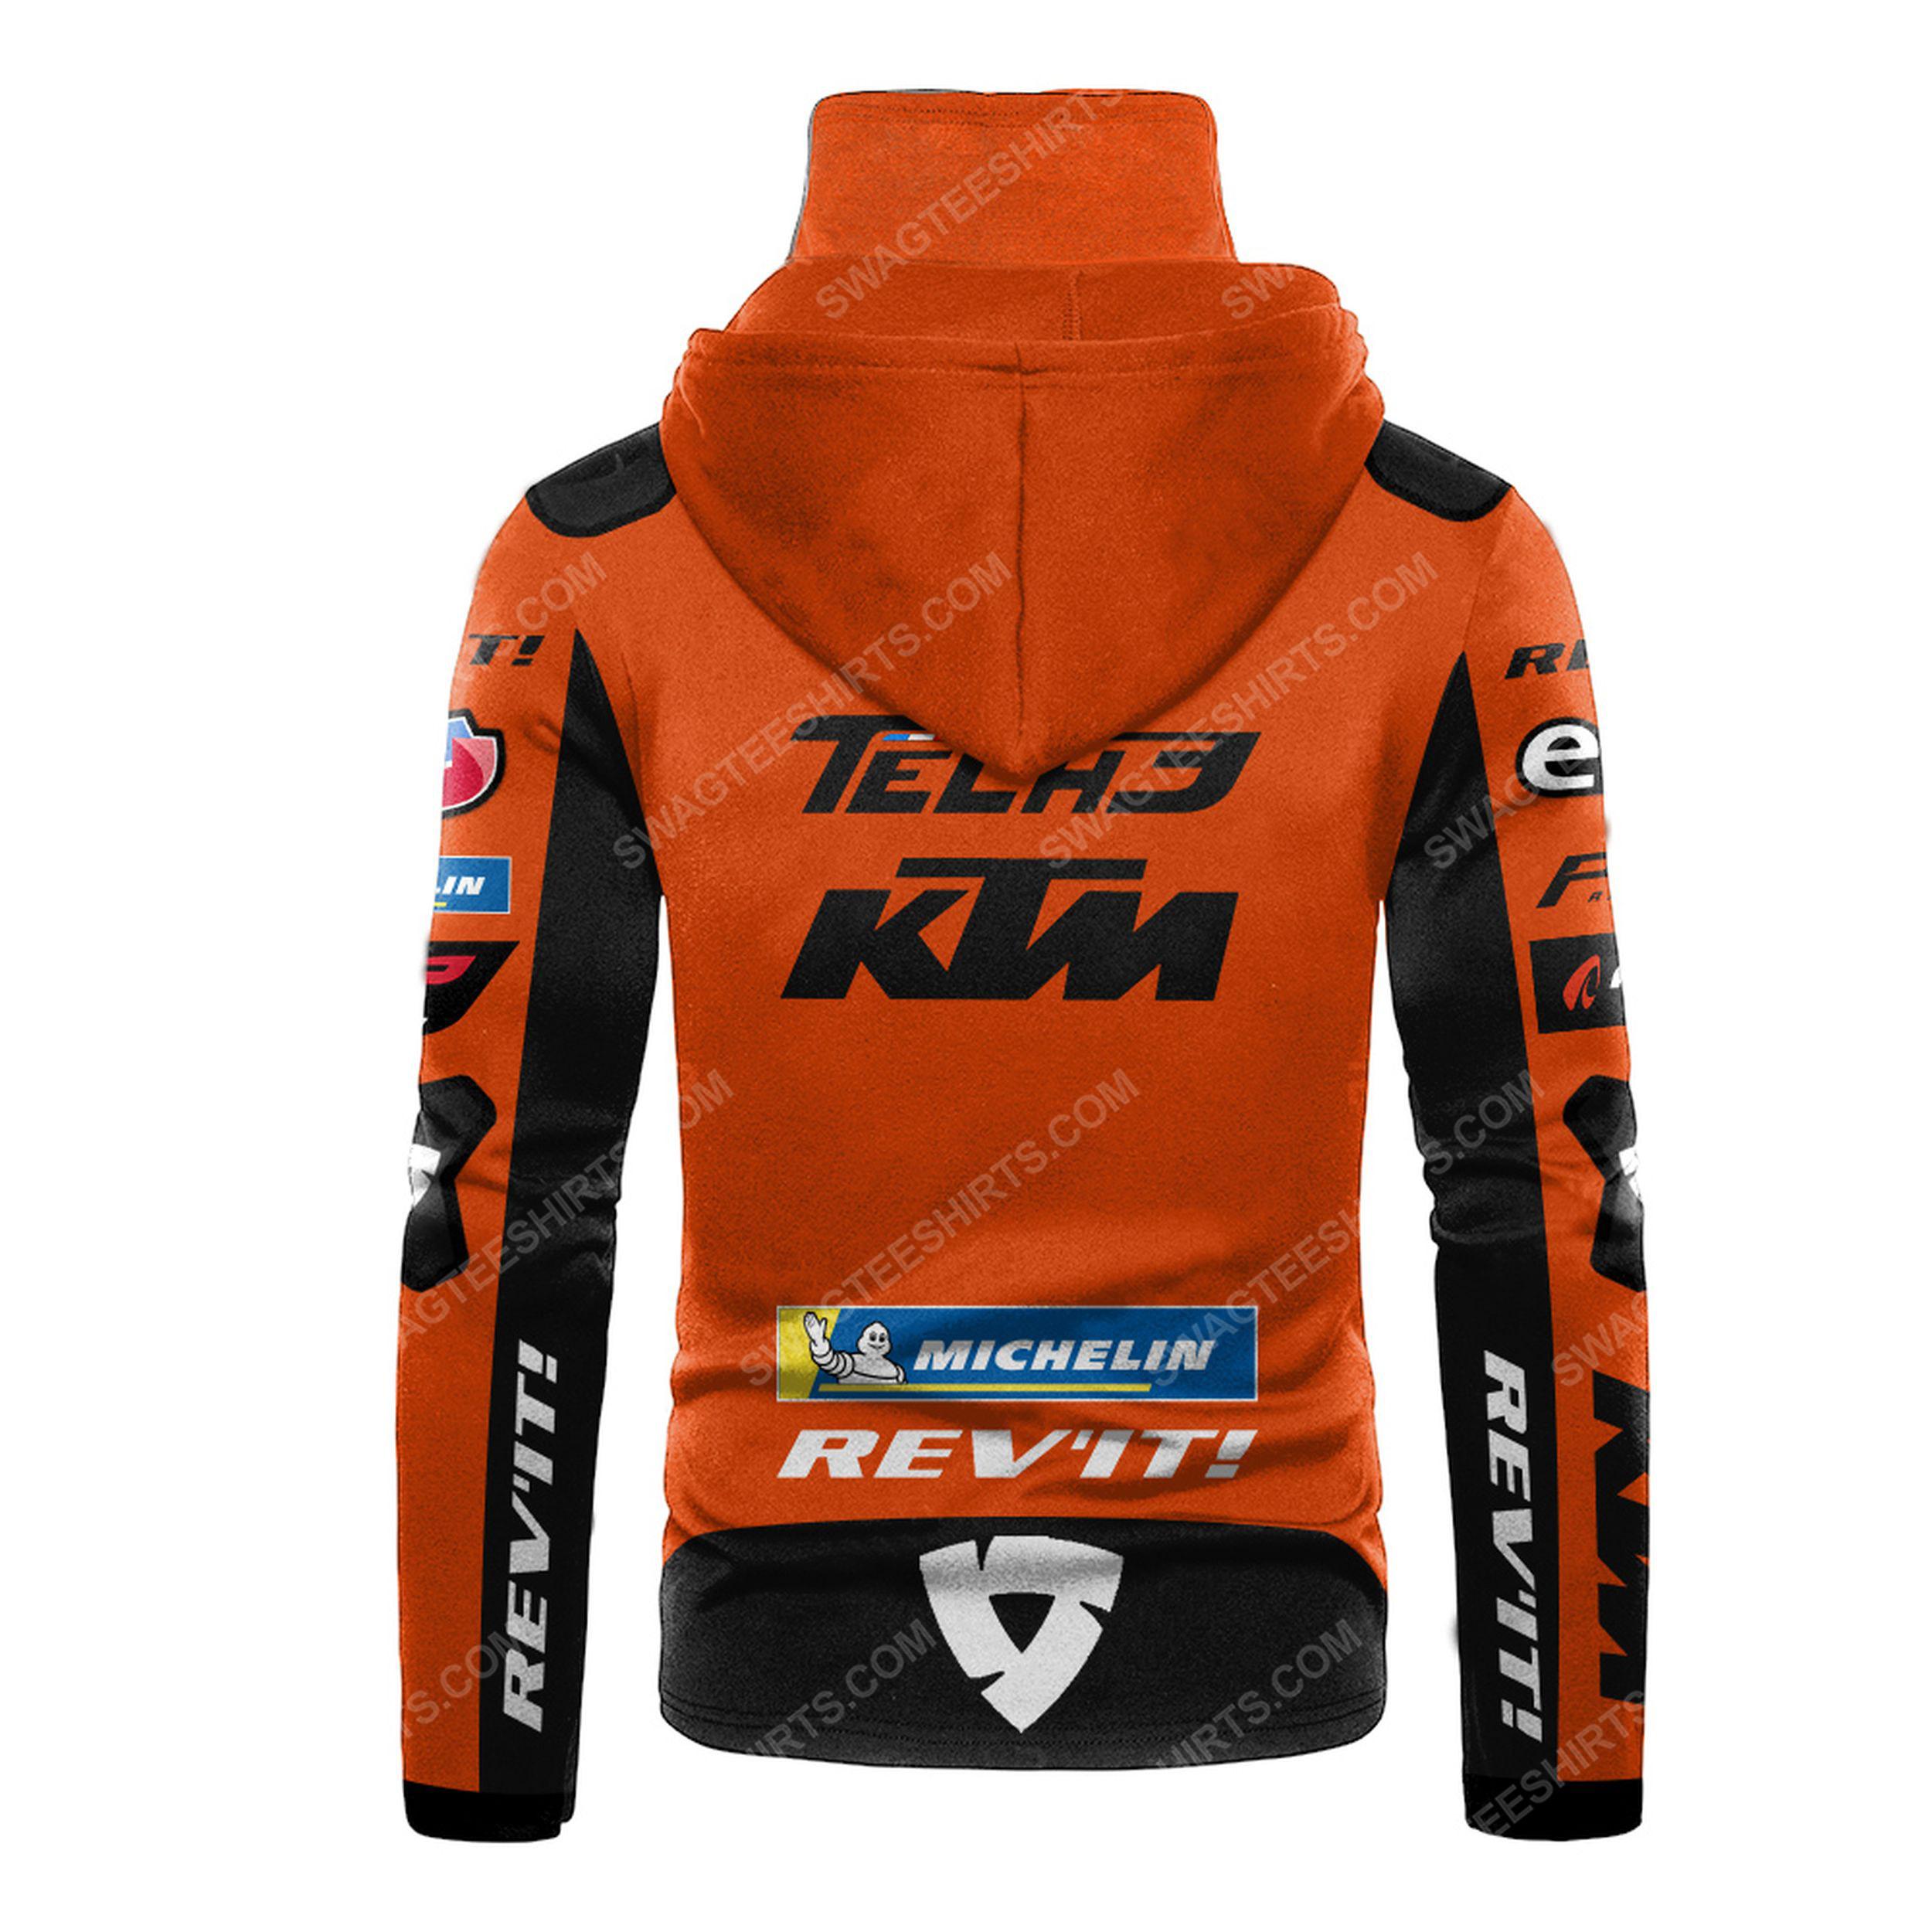 Custom name tech3 ktm factory racing full print mask hoodie 3(1) - Copy